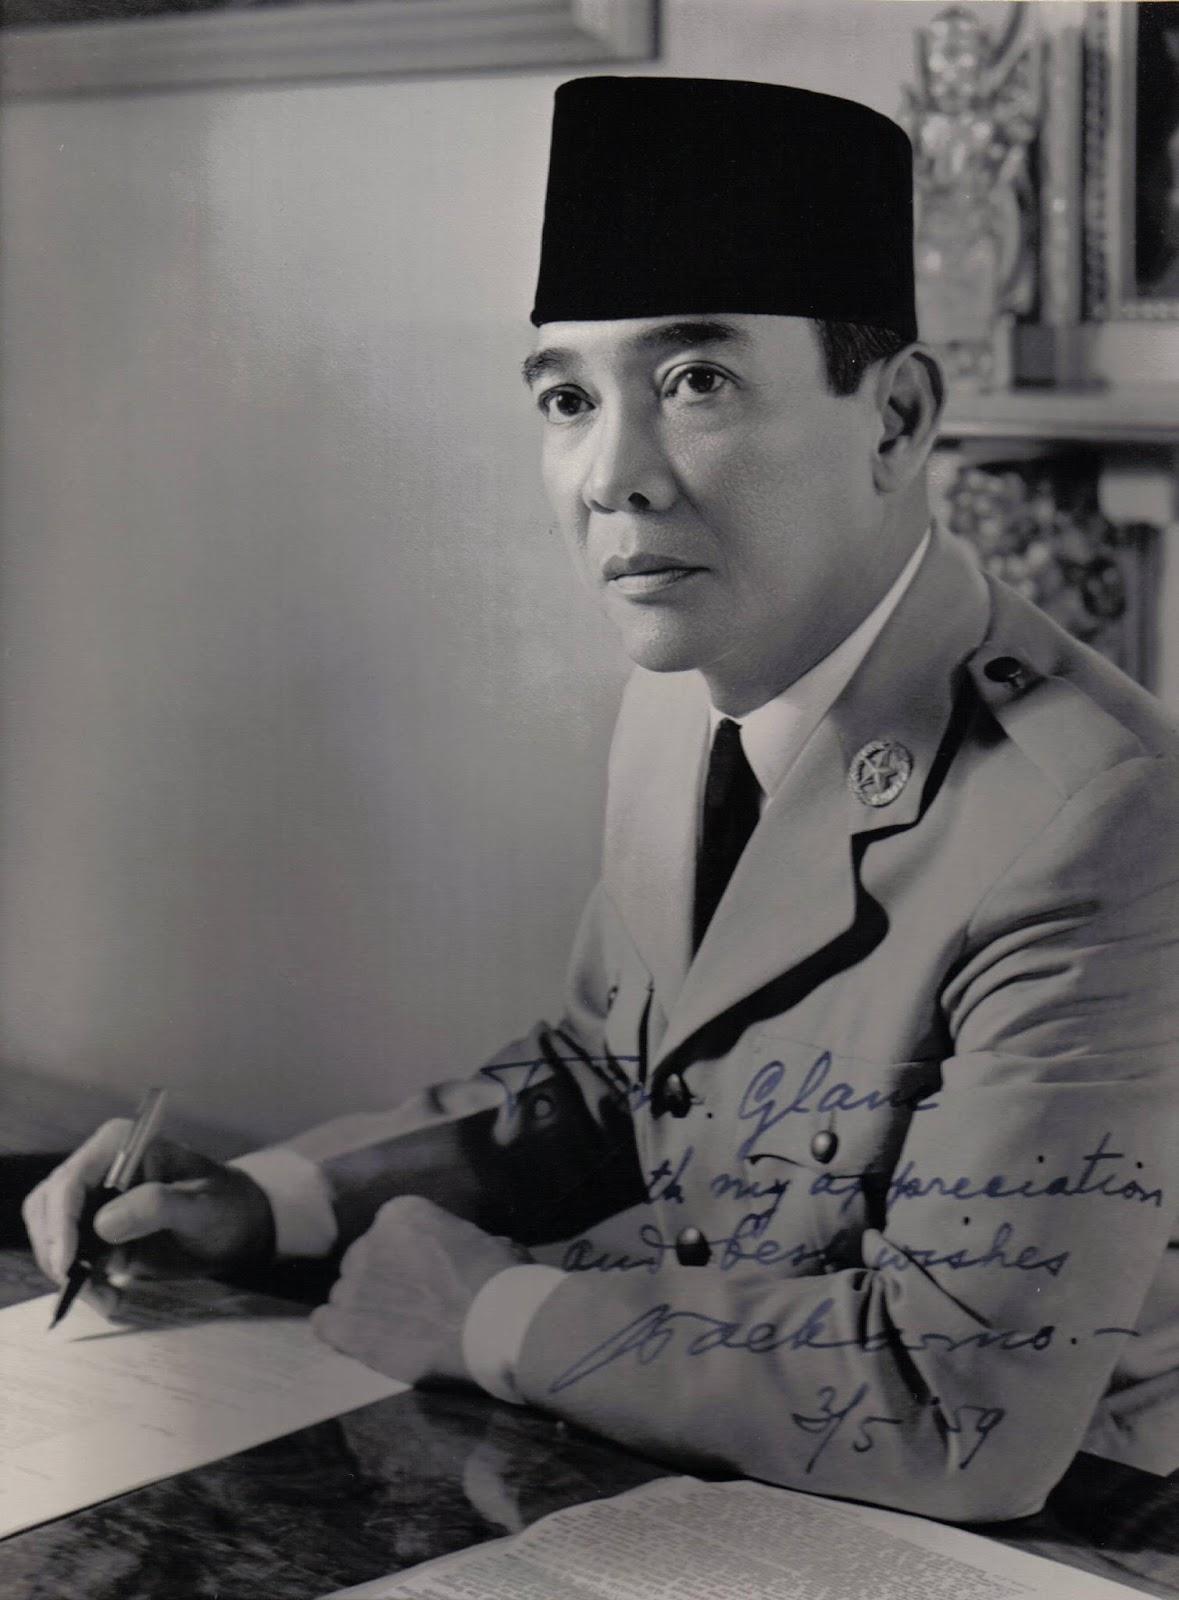 Scientist Is Everything The Biography Of Ir Soekarno